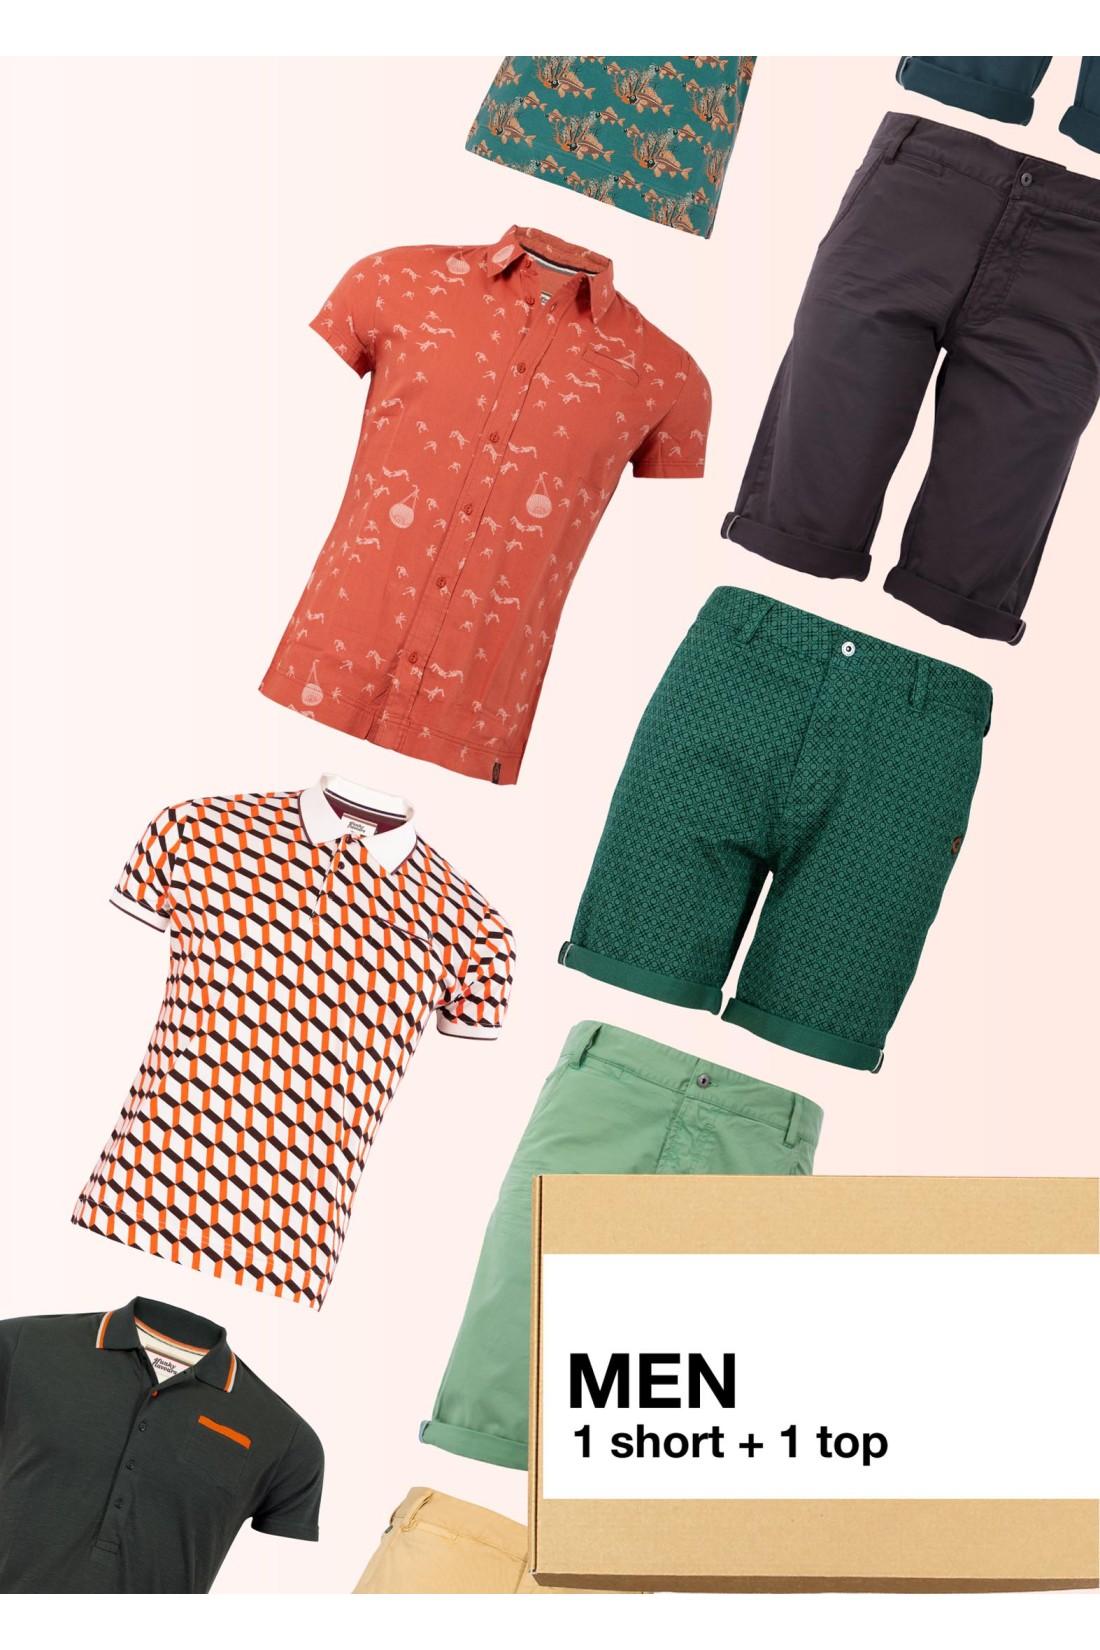 Surprise Box Men - 2 Styles - Trousers Short + 1 Top Short Sleeve